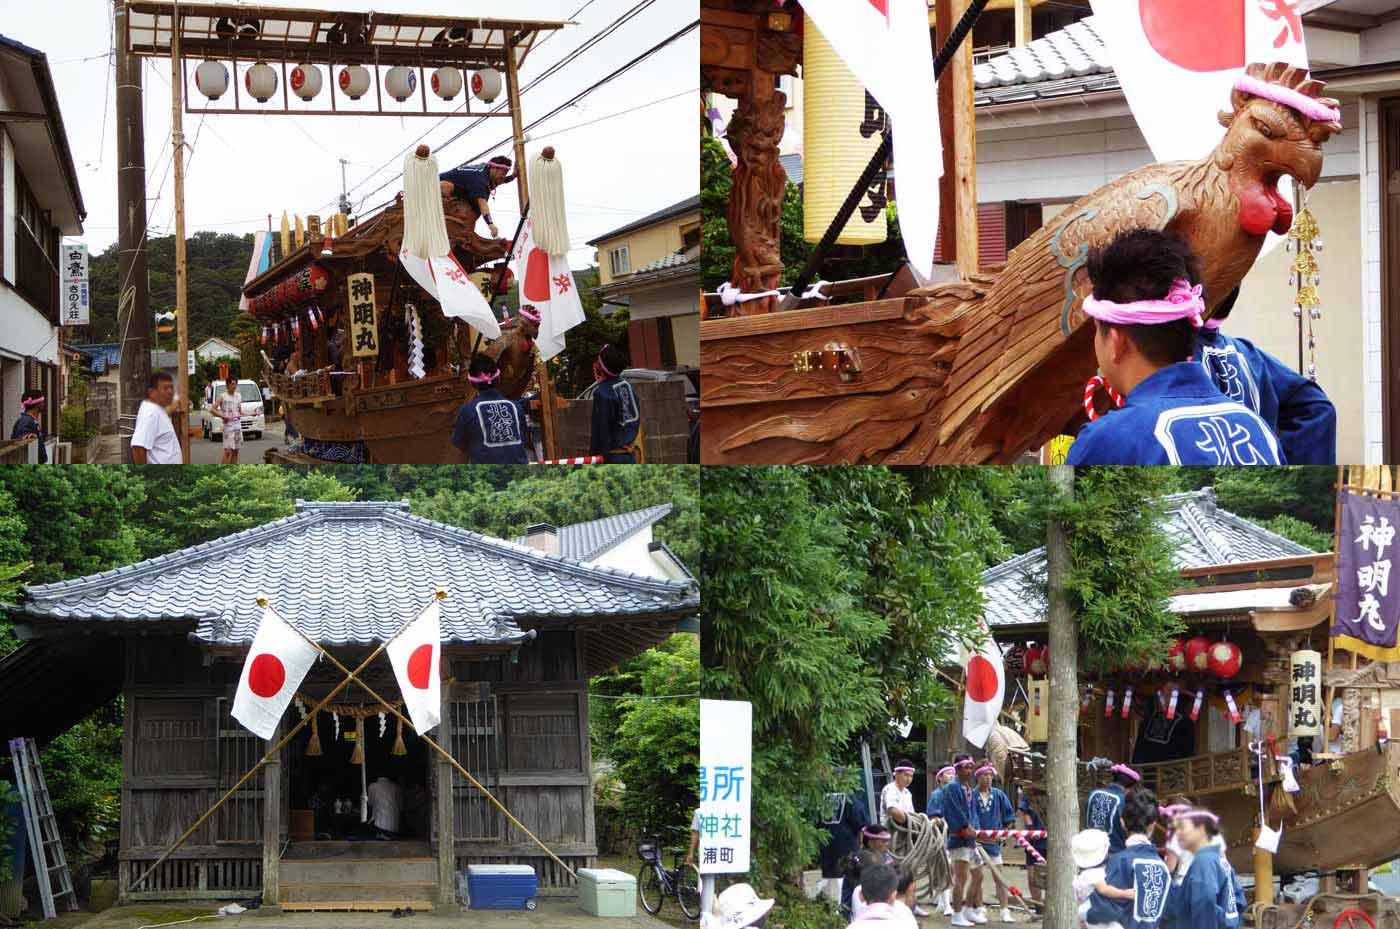 多田良北浜 北浜神明神社の祭礼の様子